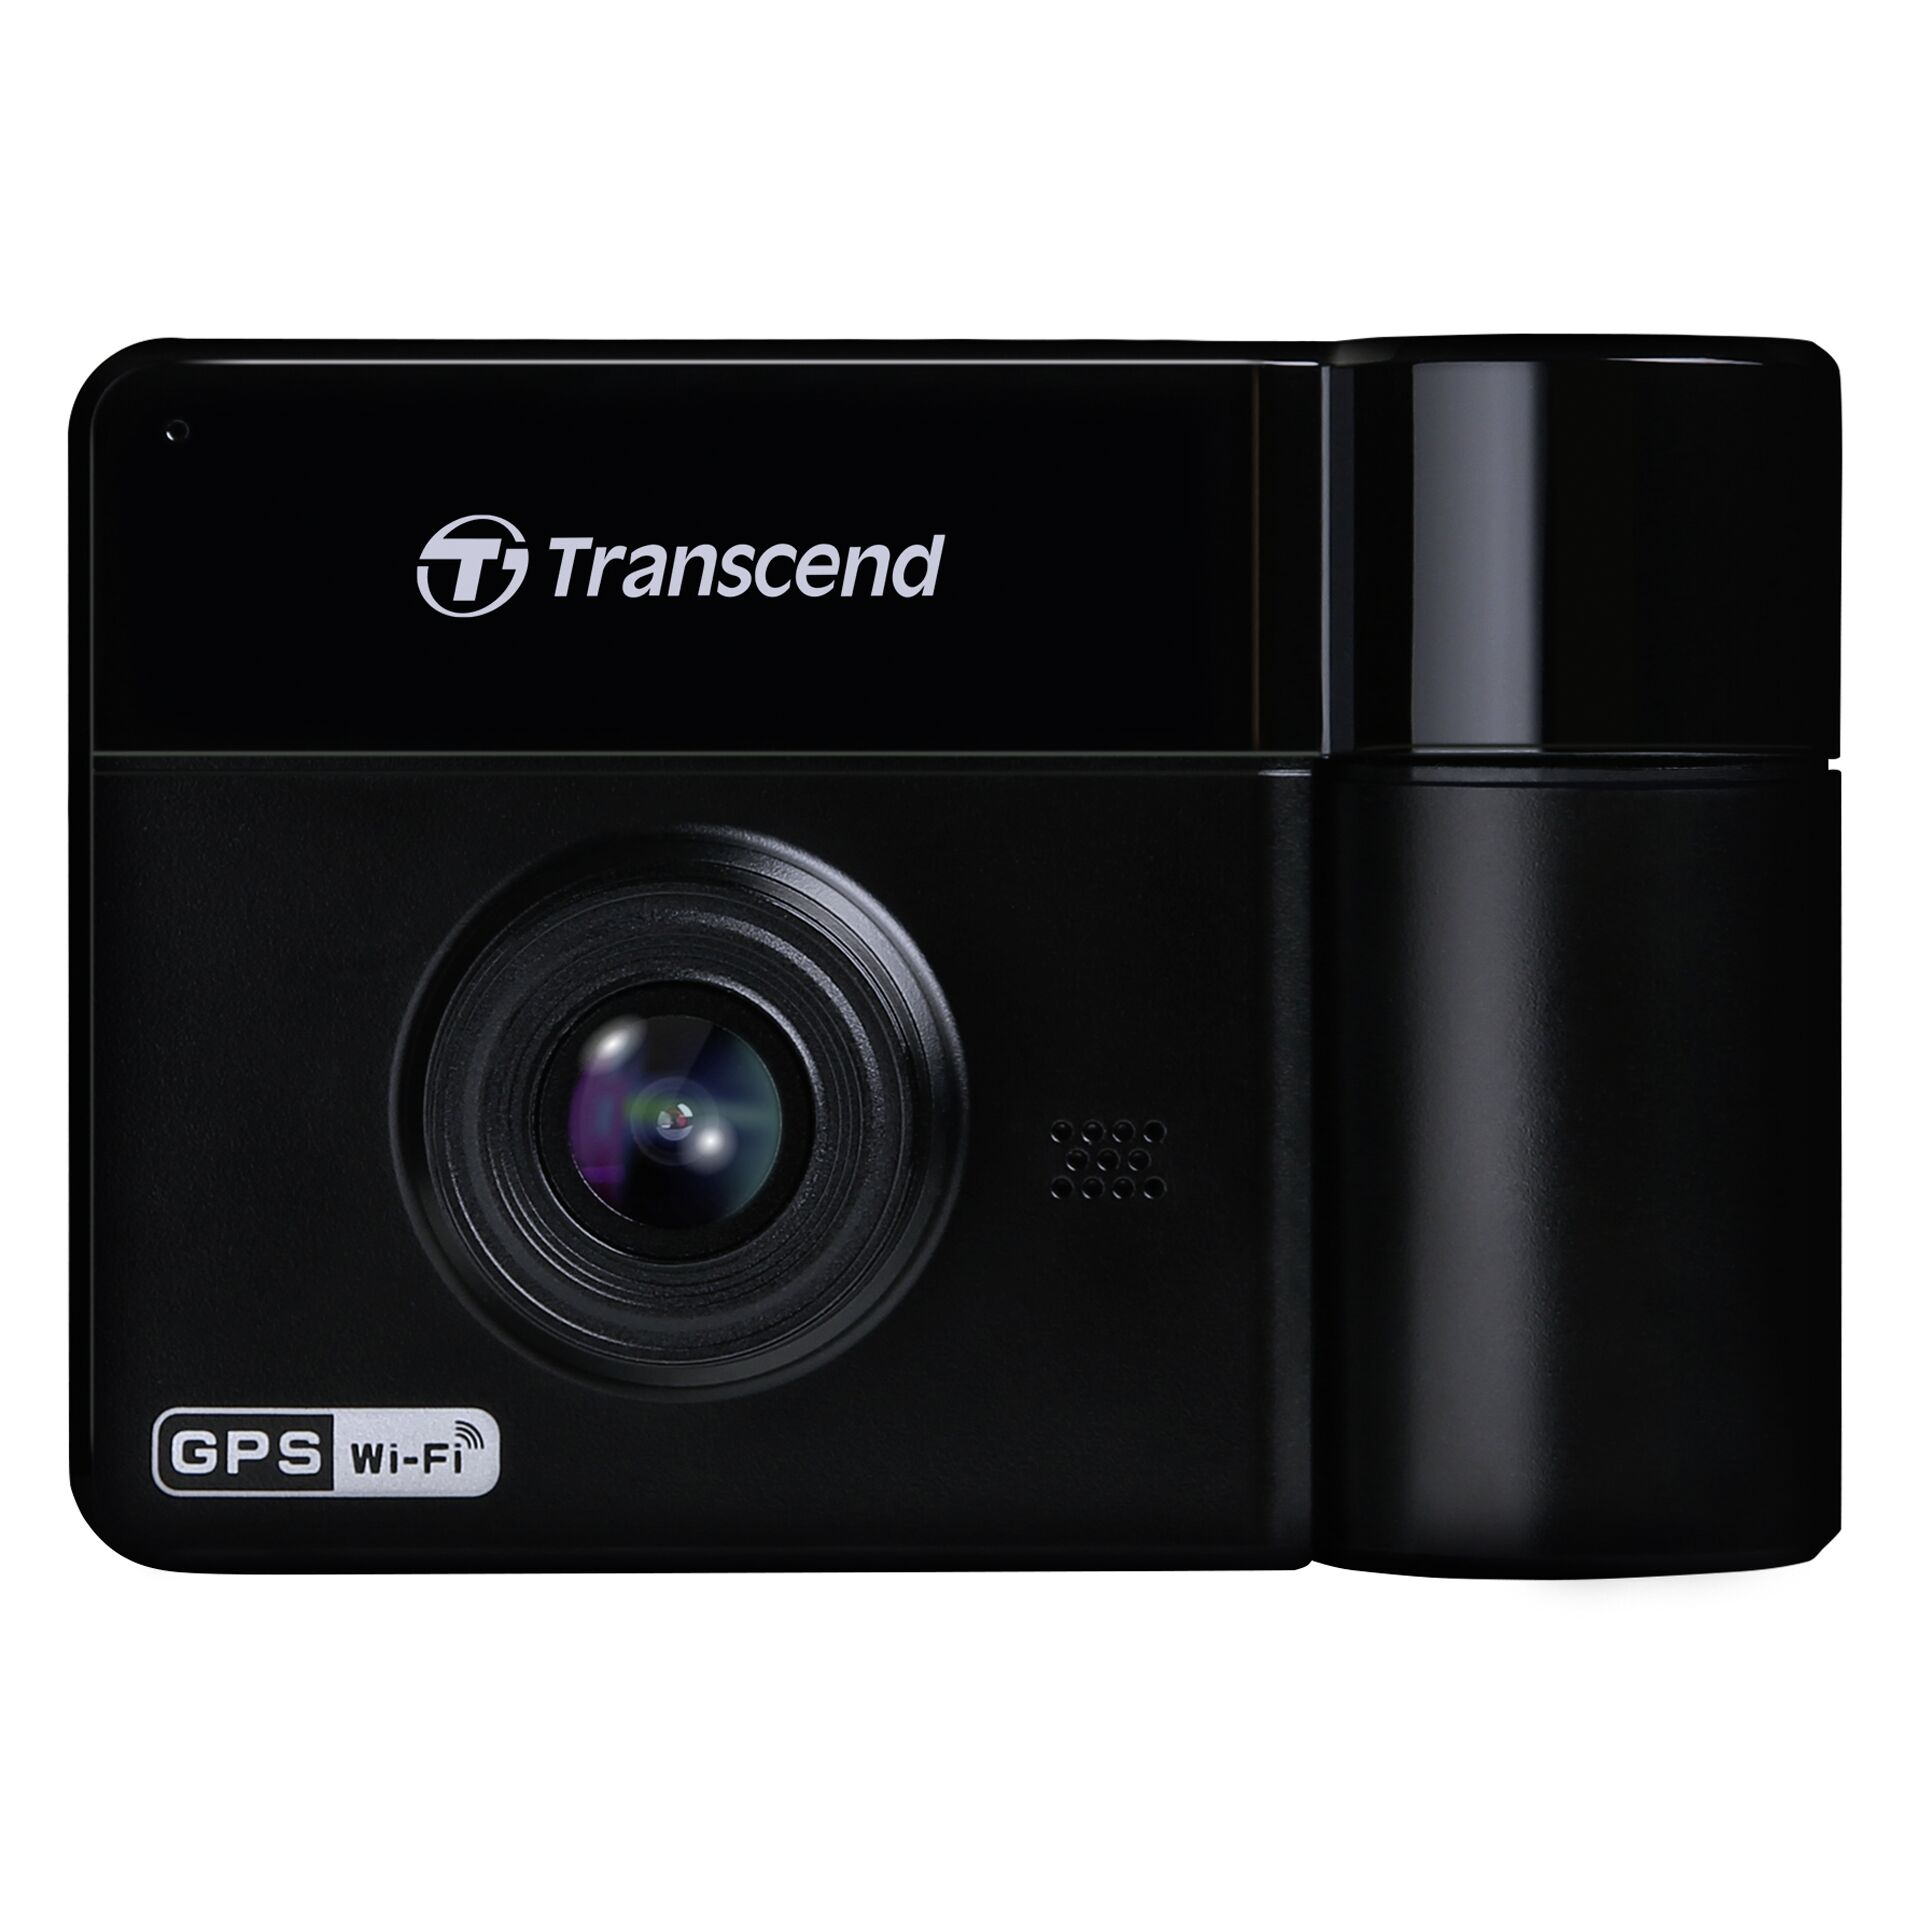 Transcend DrivePro 550 Dual 1080 Kamera inkl. 64GB microSDXC MLC